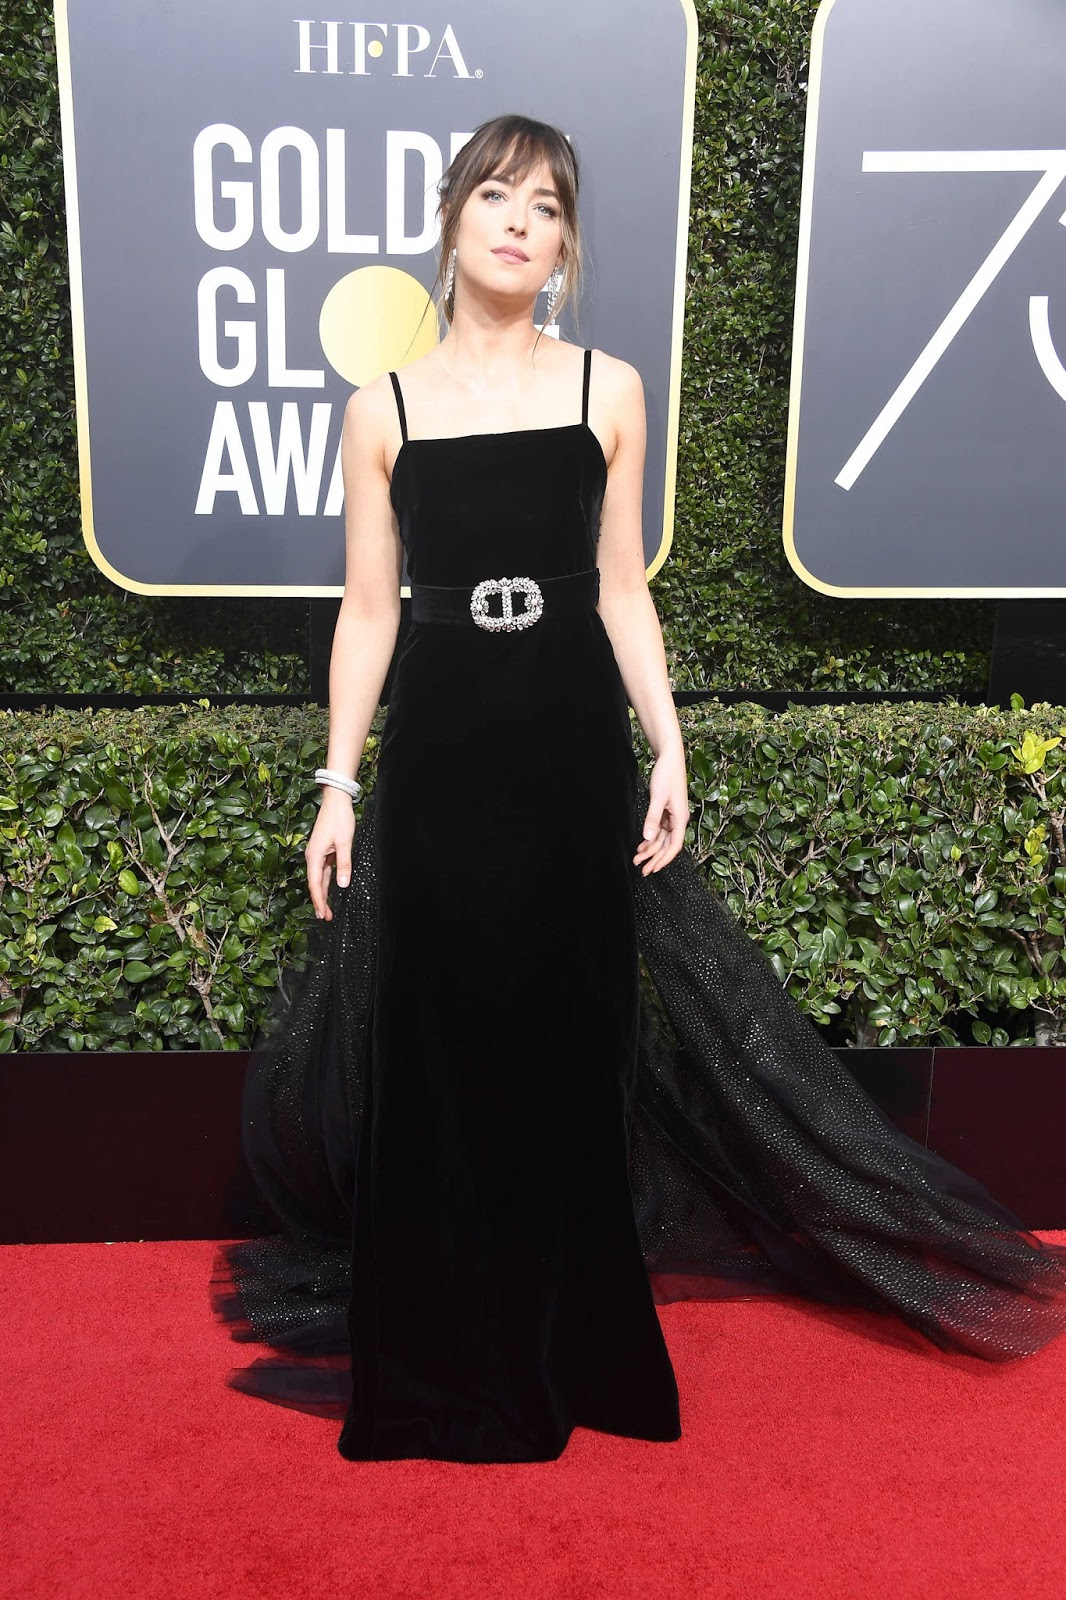 Dakota Johnson Posing at 75th Annual Golden Globe Awards